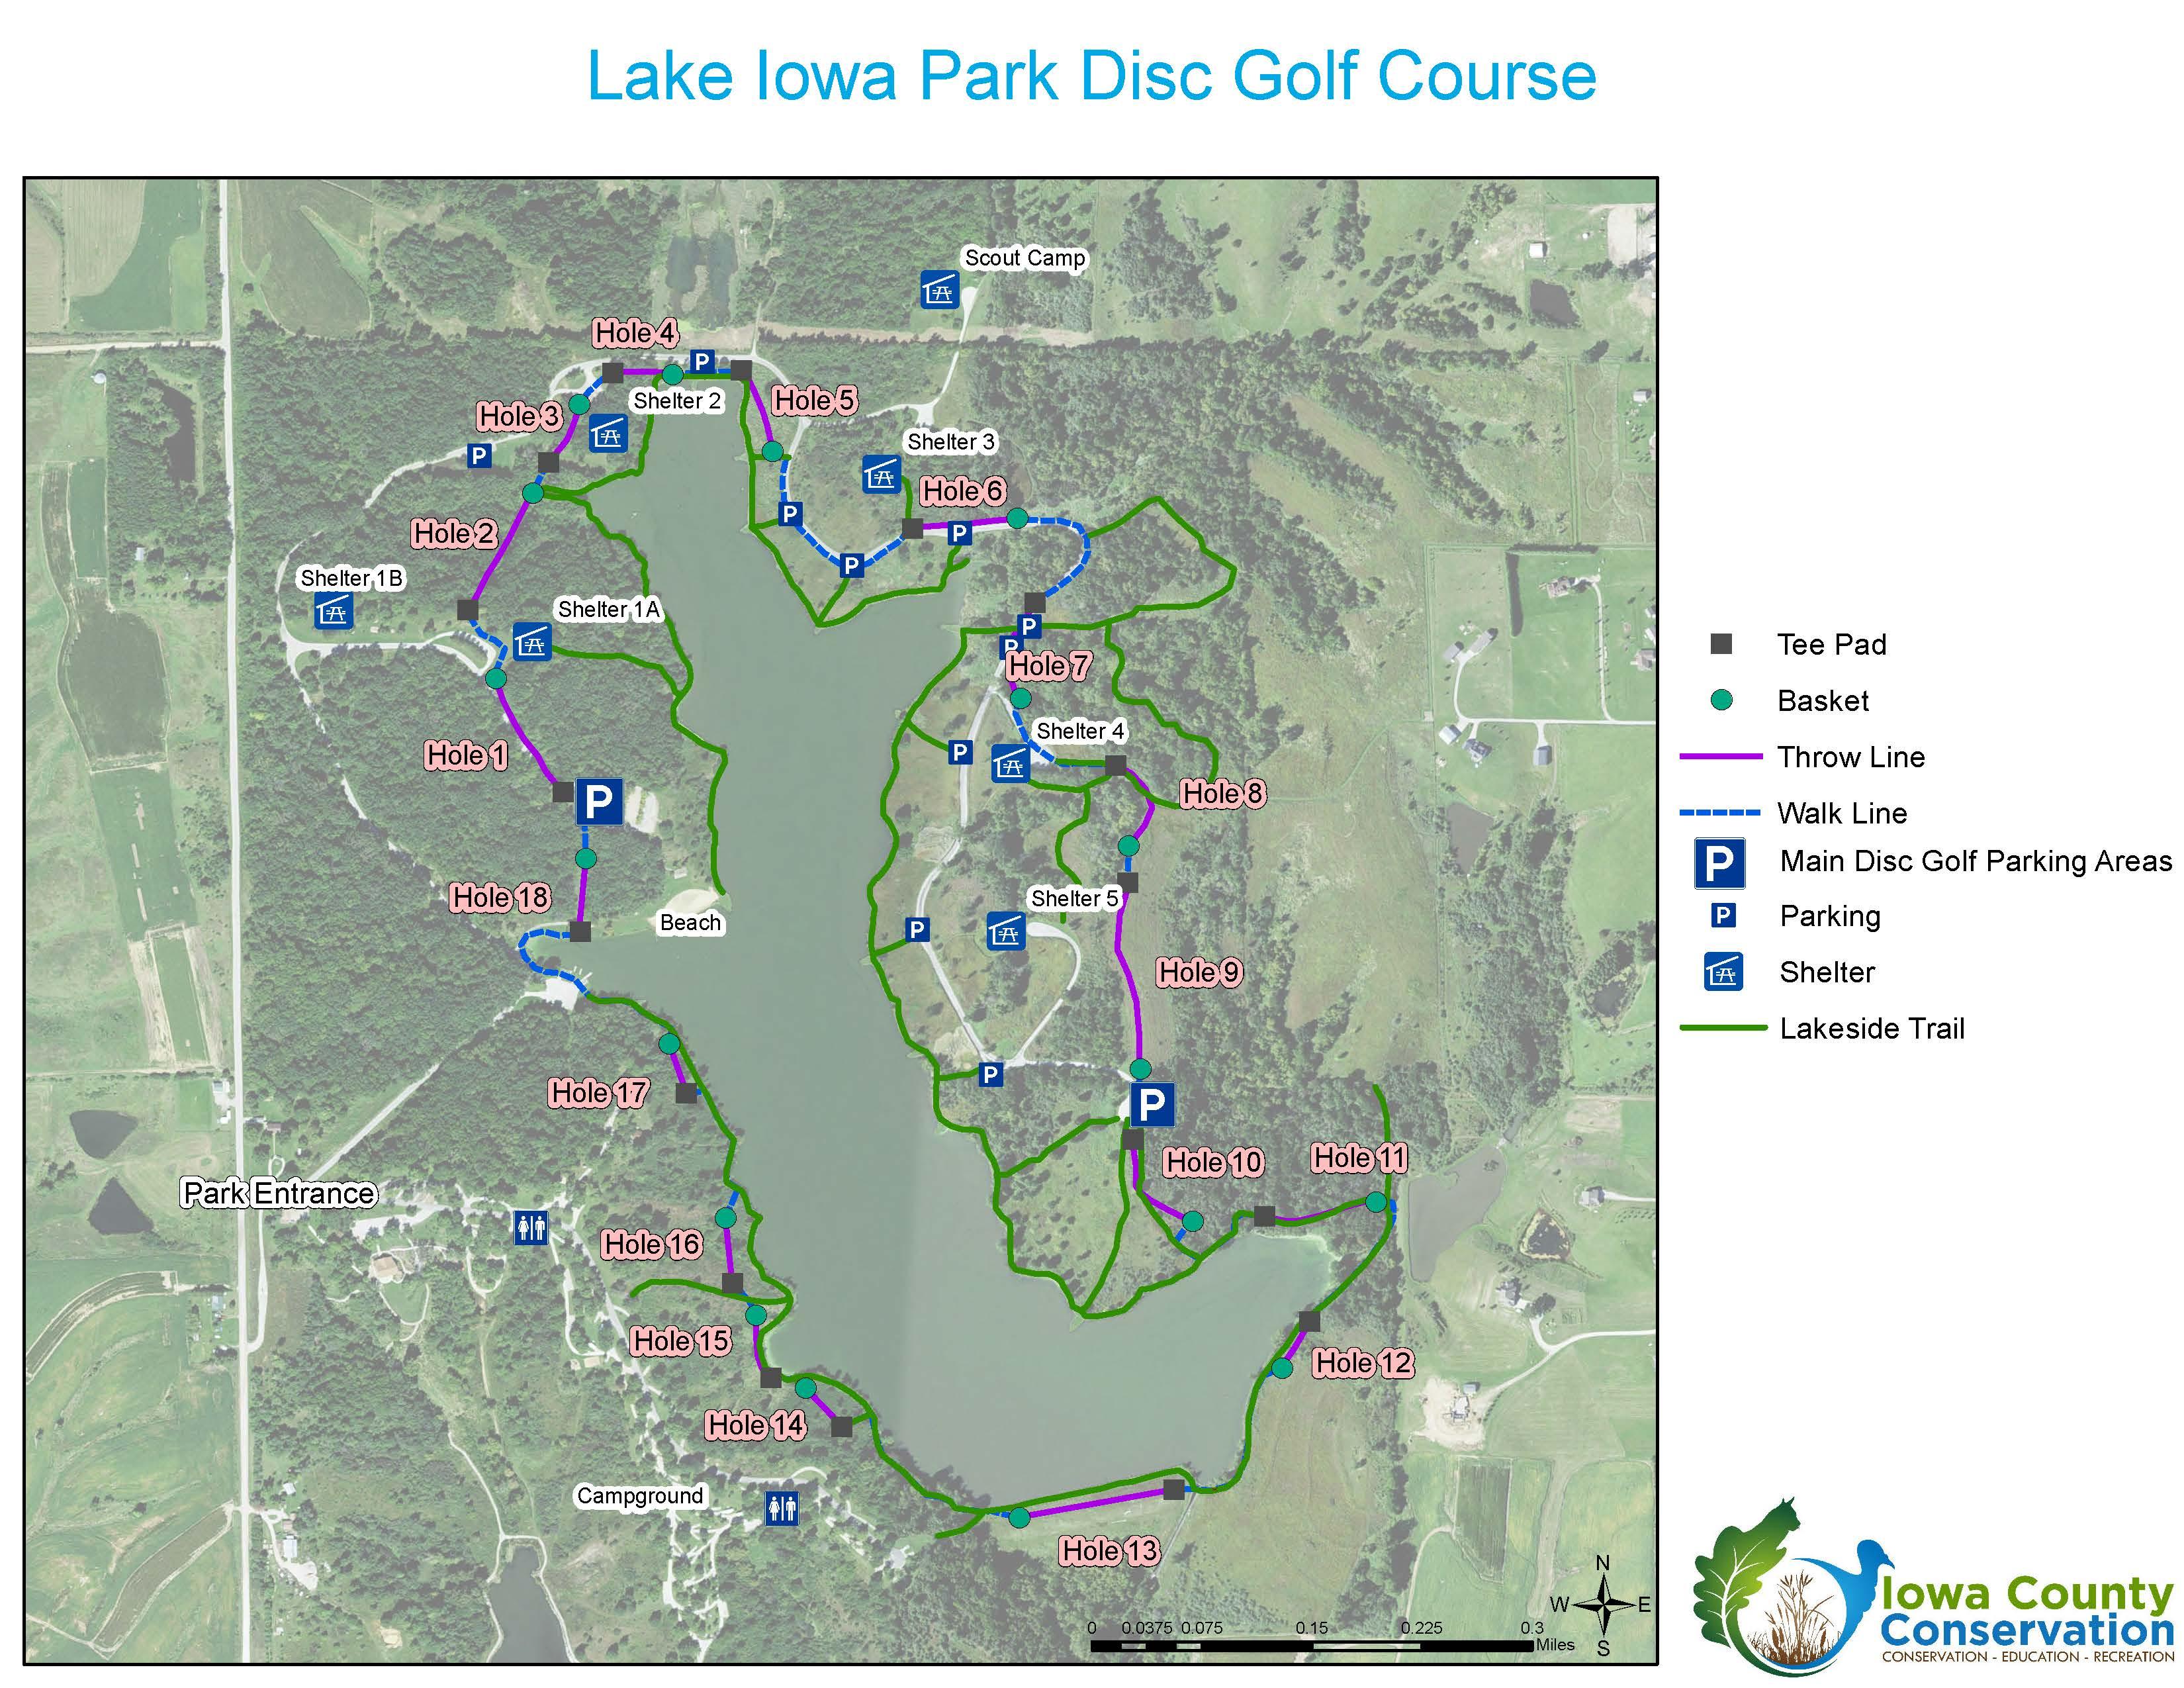 Disc Golf Course at Lake Iowa Park